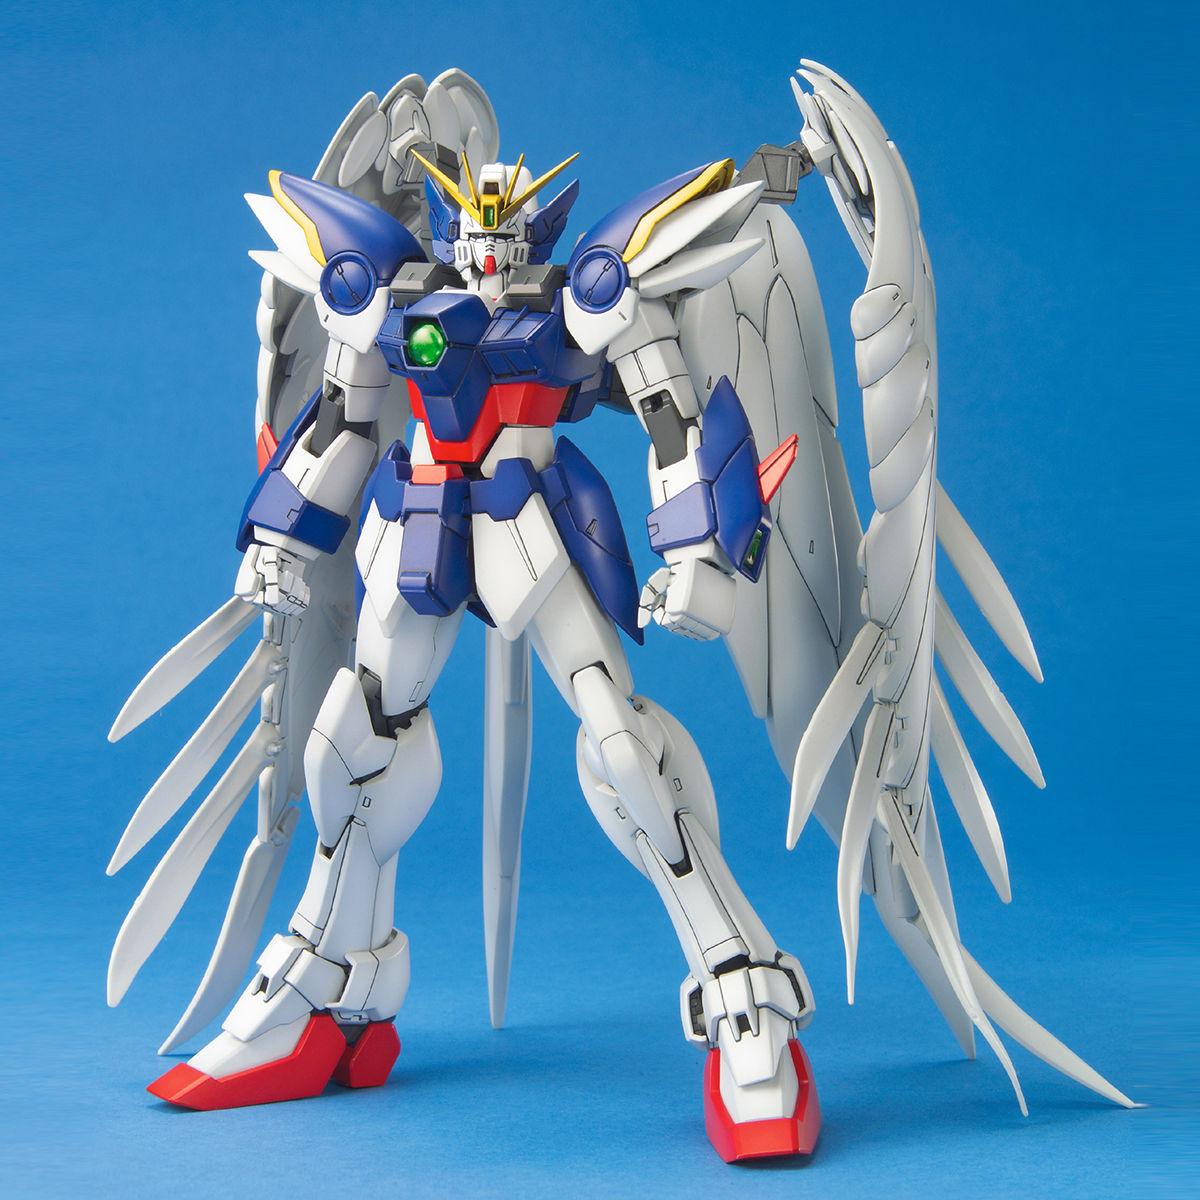 MG 1/100 XXXG-01W ウイングガンダム EW [Wing Gundam EW](エンドレスワルツ版)